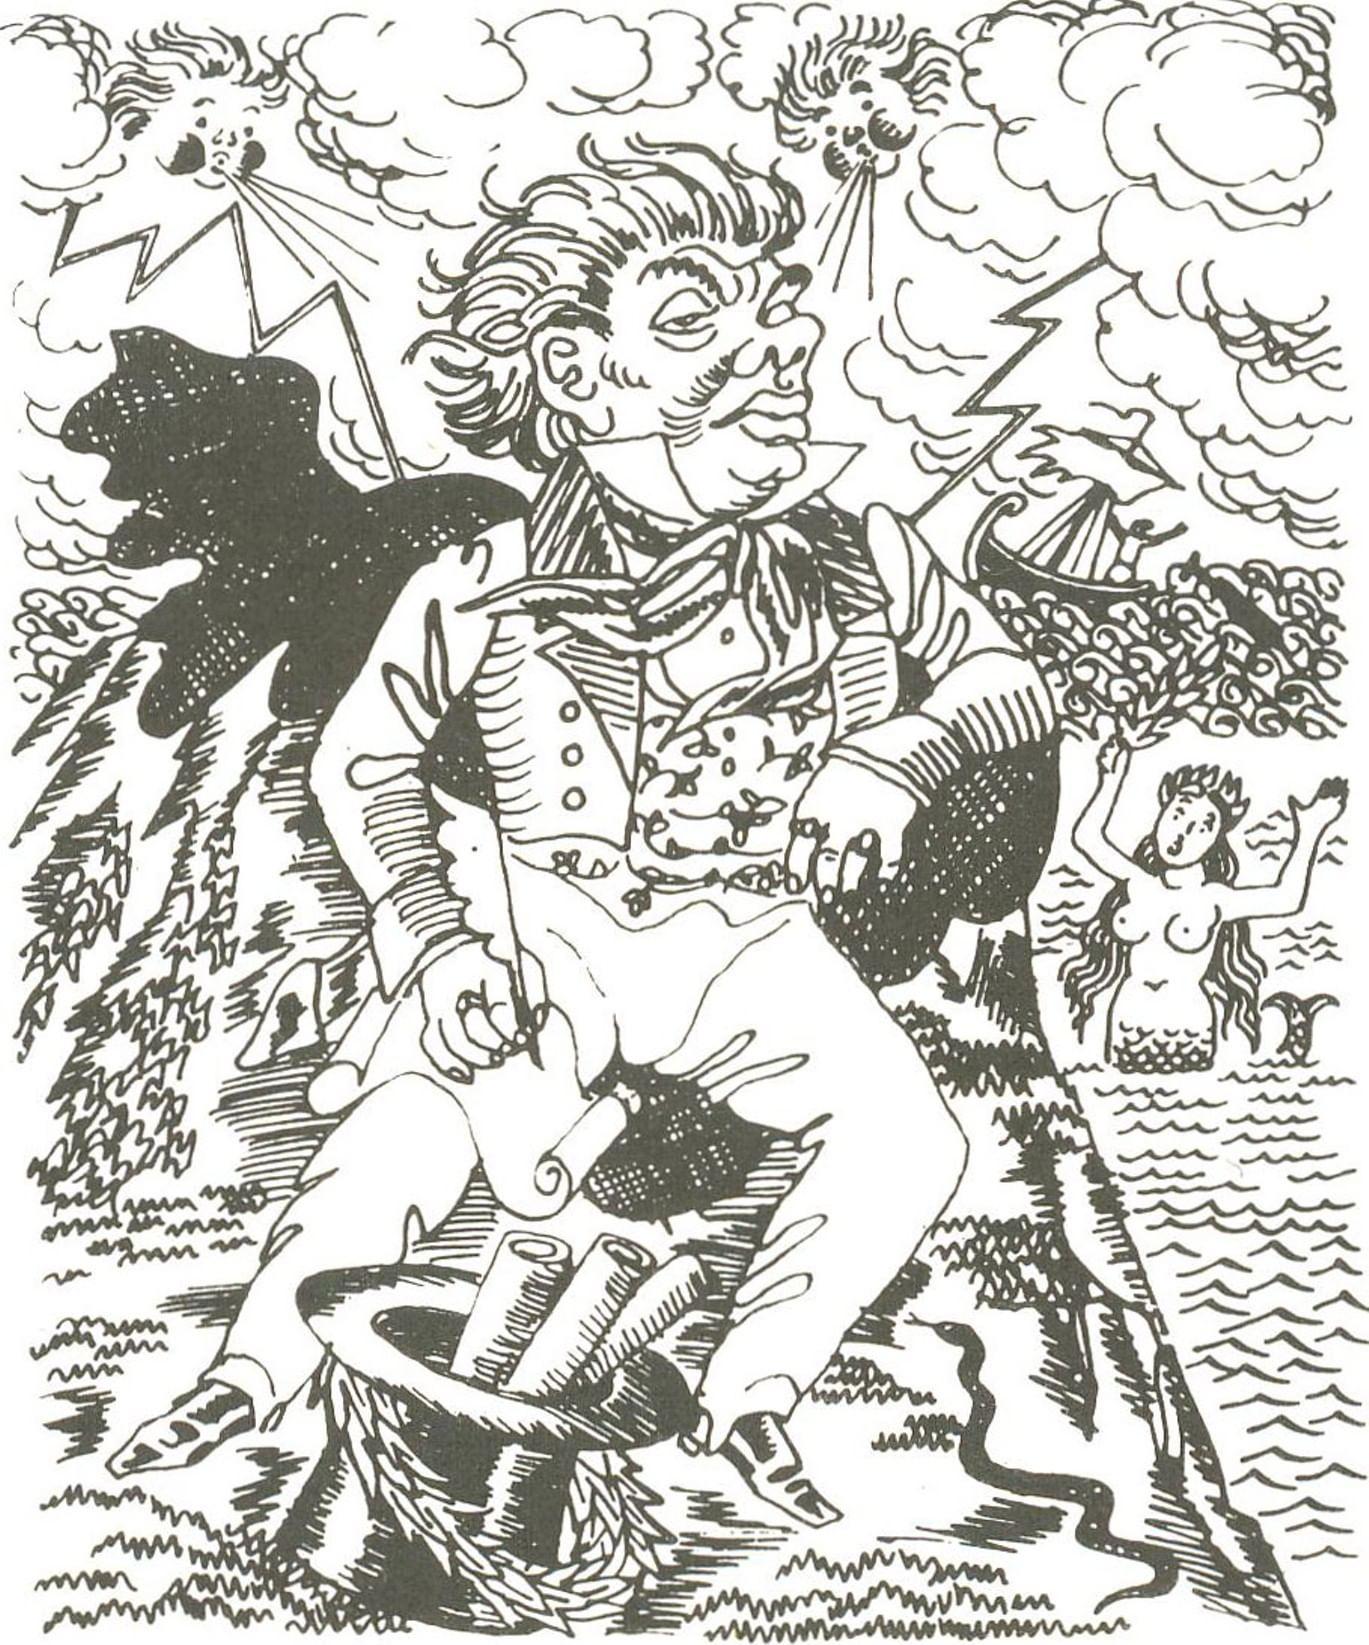 Литературная мистификация XIX века. Галерея 2